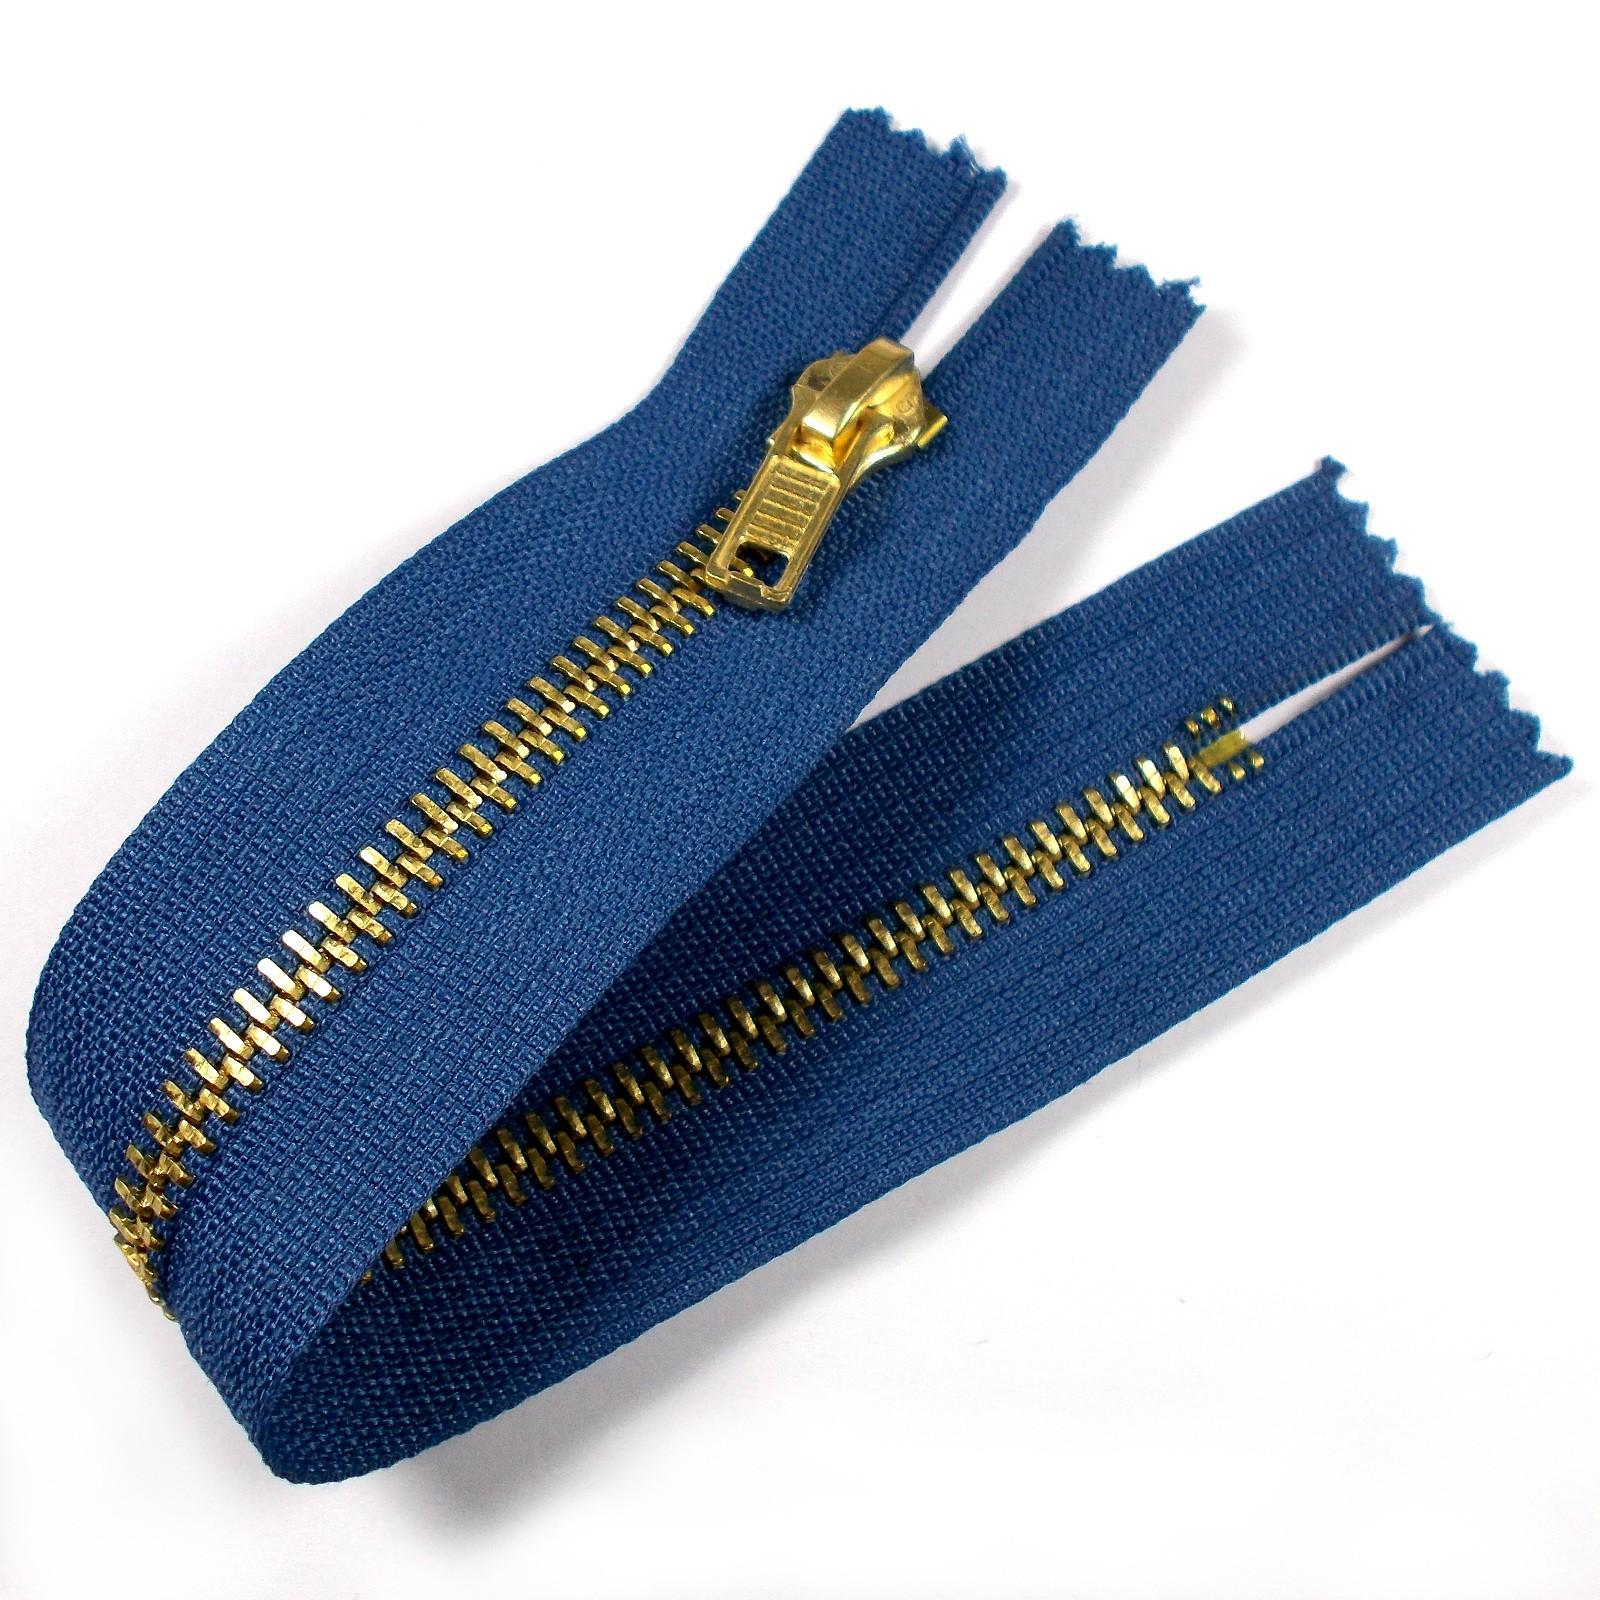 Gold Metal Trouser Jeans Zip Zipper 7 inch Blue